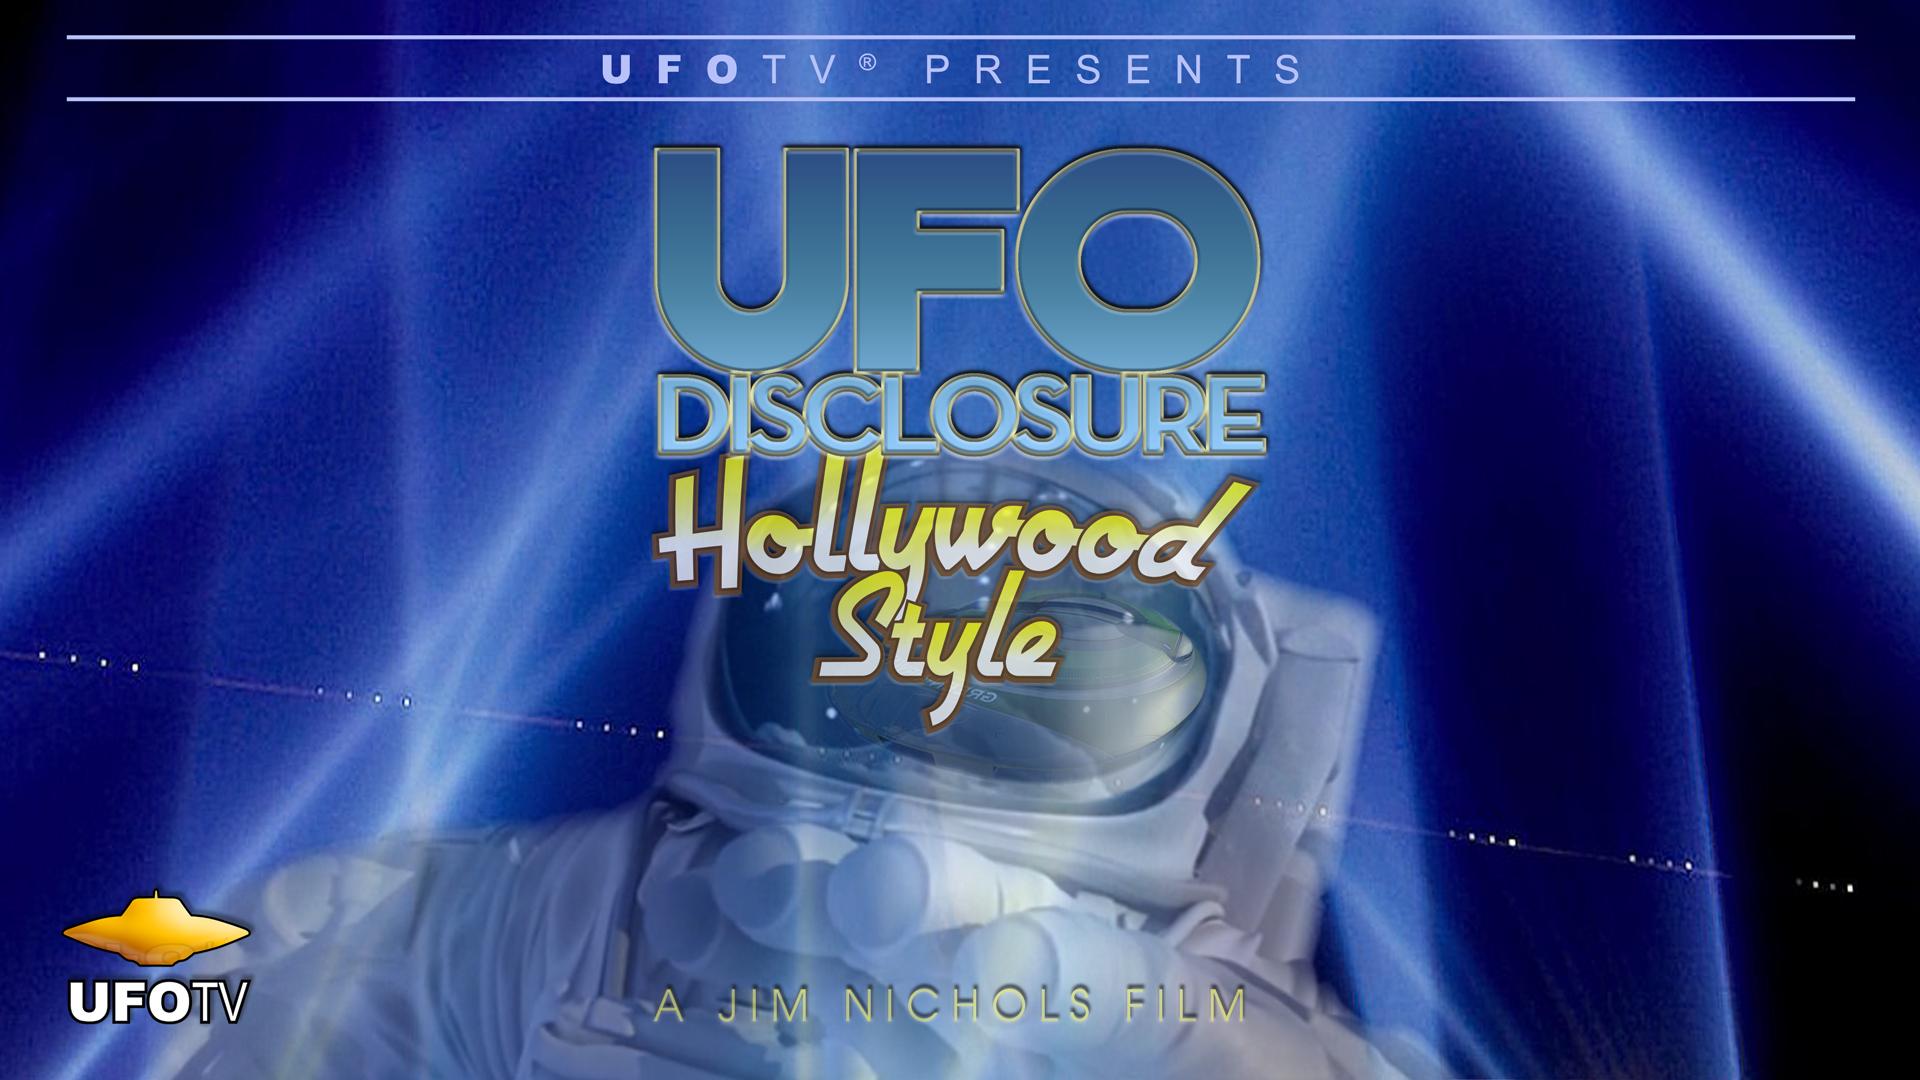 UFO Disclosure Hollywood Style